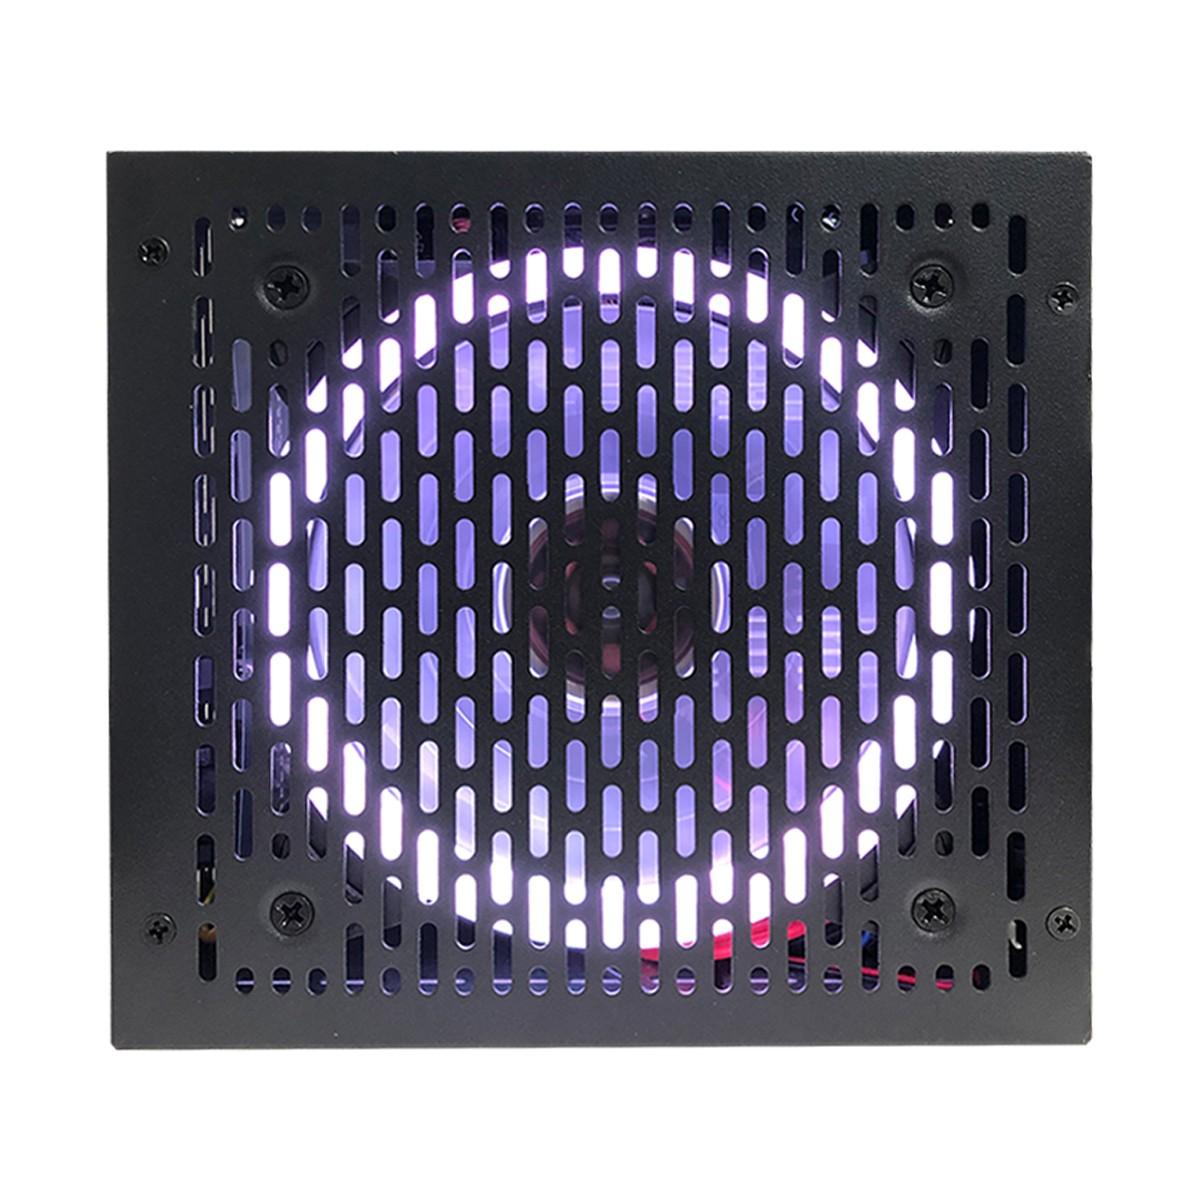 Fonte Gamer ATX BRX Rainbow 550W Real, 80 Plus Bronze, Cooler 120mm RGB, Bivolt Automático